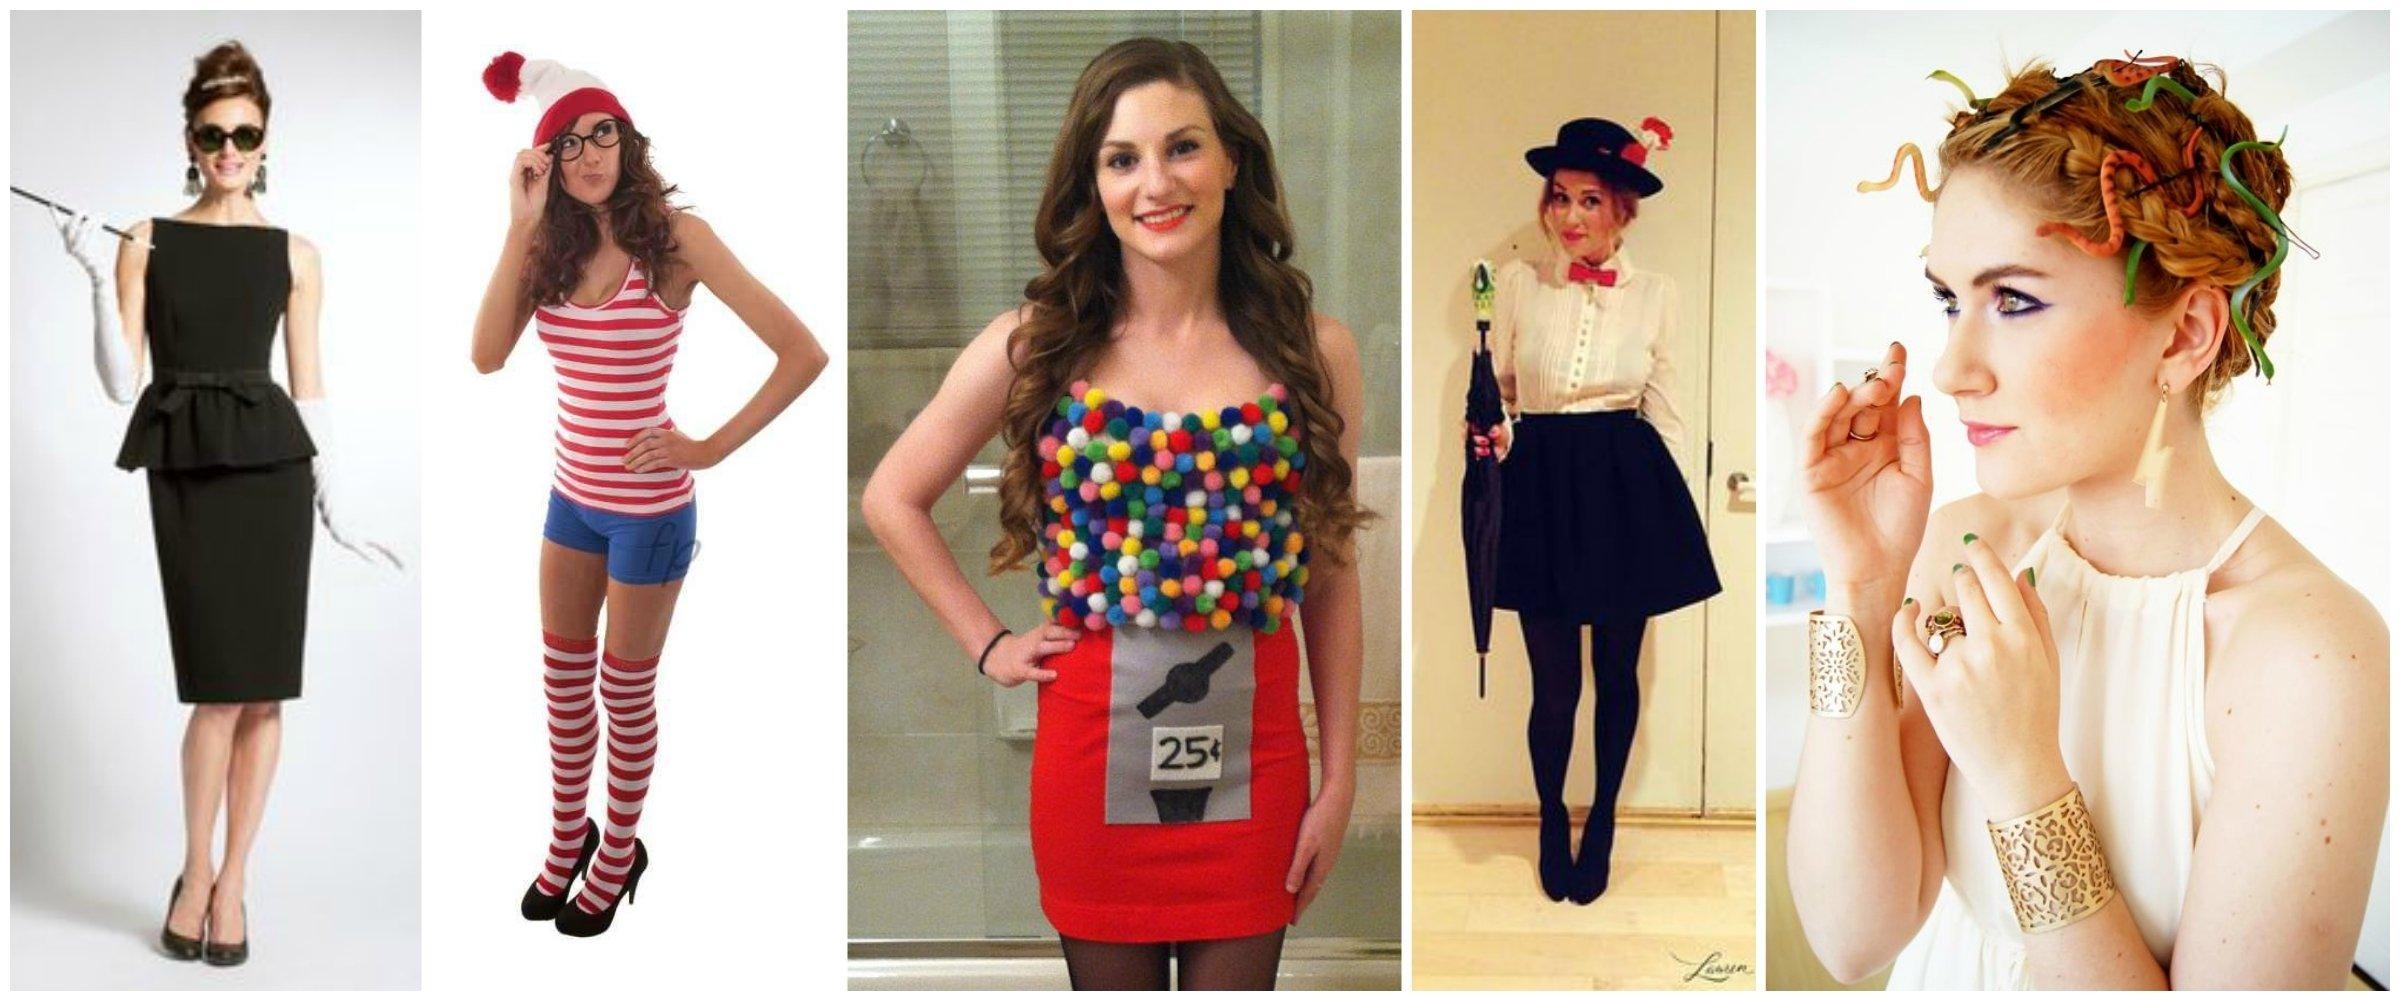 10 Wonderful Homemade Halloween Costumes Ideas For Adults image gallery homemade halloween costumes girls diy halloween 5 2021